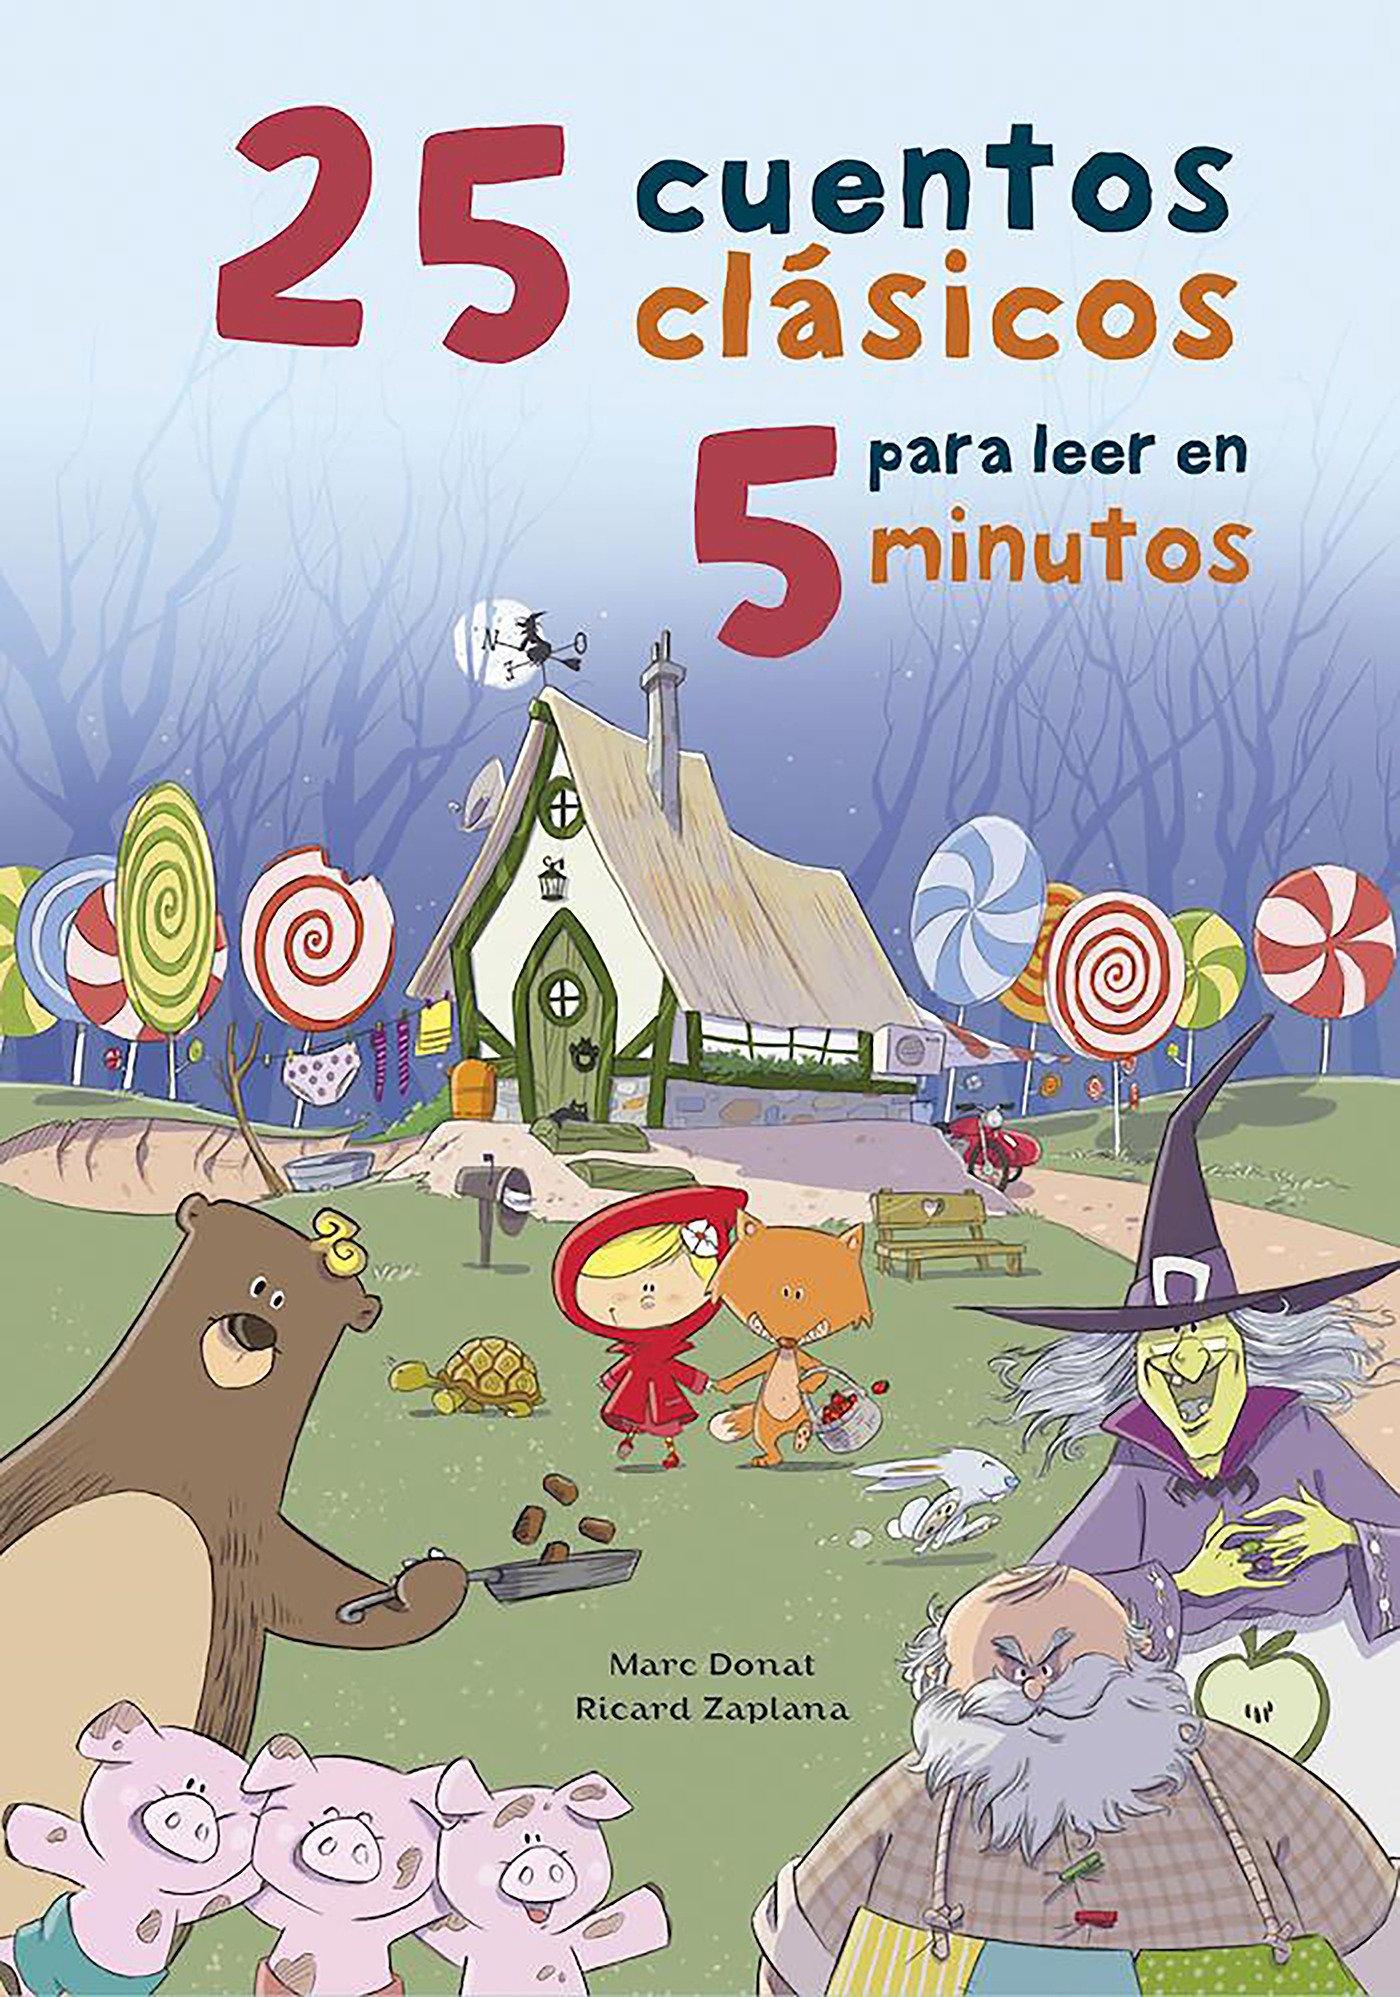 Download 25 cuentos clasicos para leer en 5 minutos / 25 Classic Stories to Read in 5 Min utes (Spanish Edition) PDF